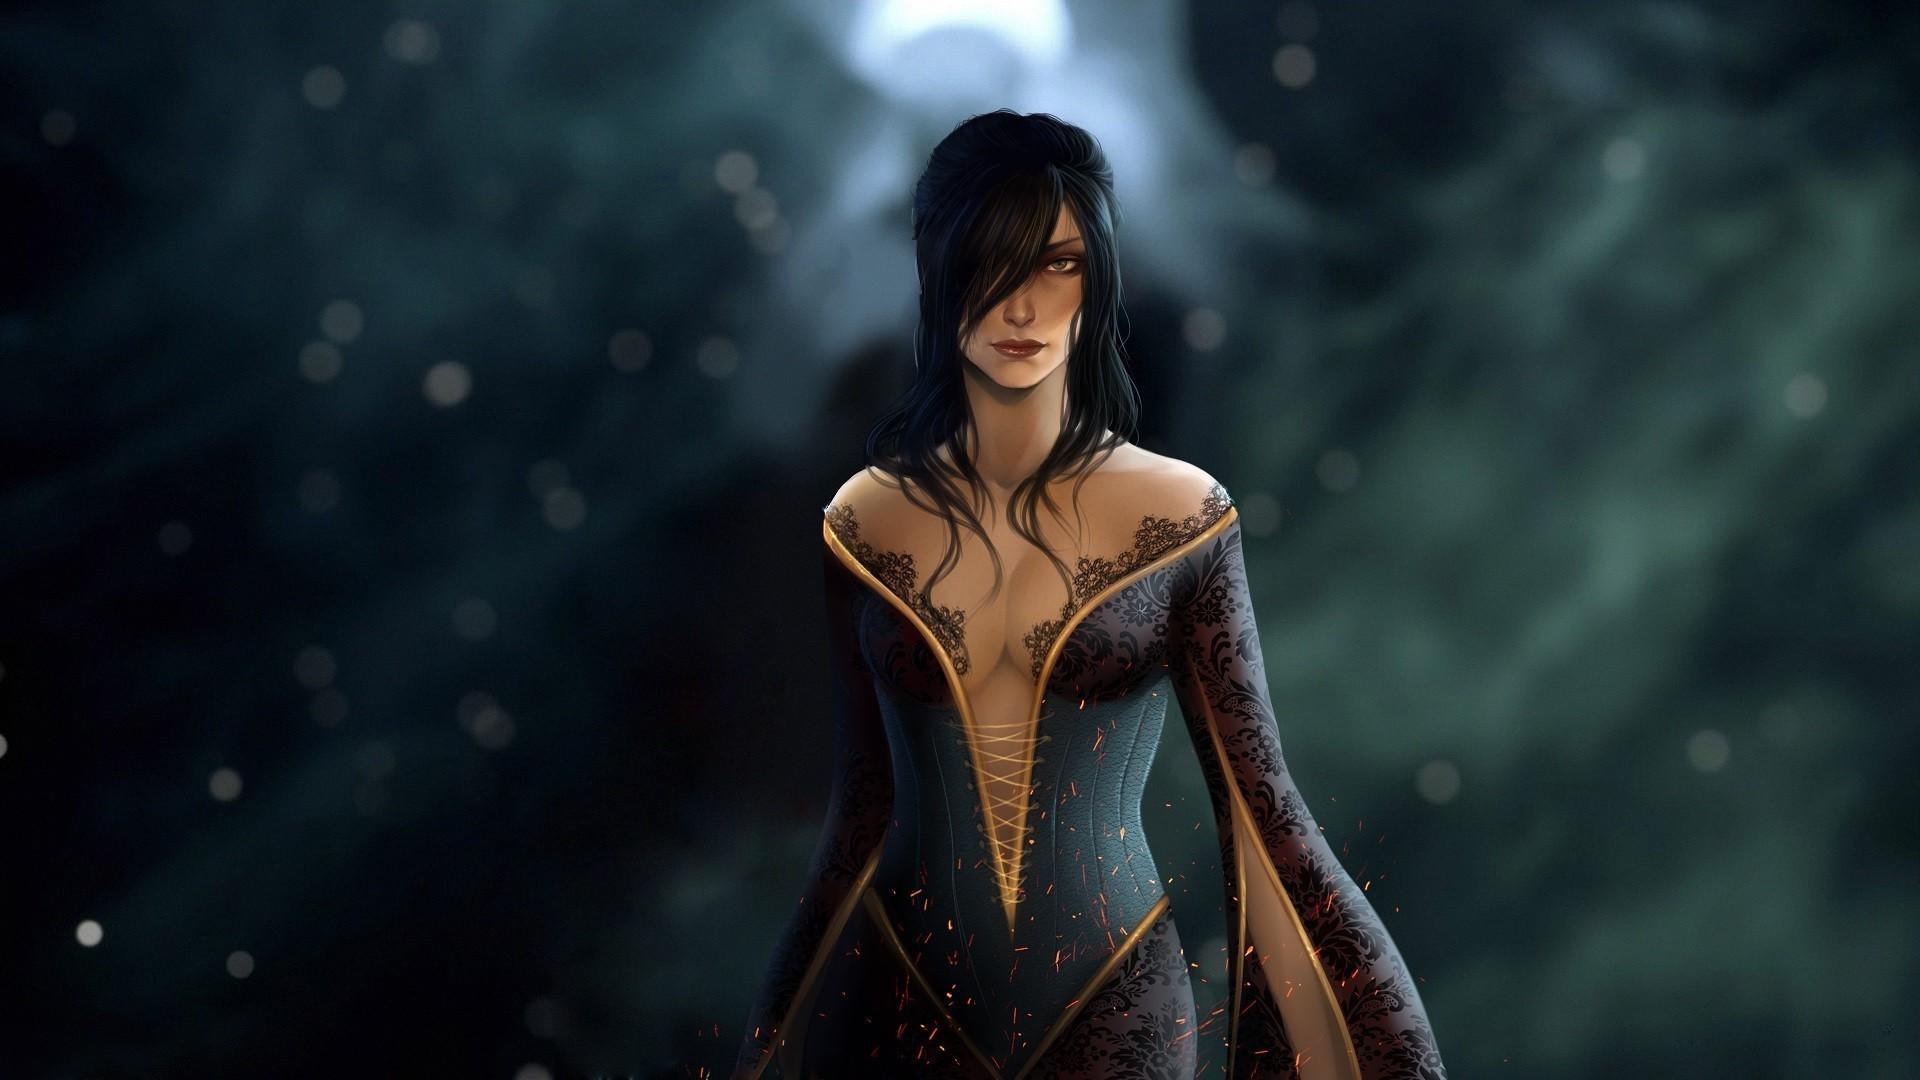 artwork, Fantasy Art, Morrigan (character), Dragon Age: Inquisition, Women,  Long Hair Wallpapers HD / Desktop and Mobile Backgrounds